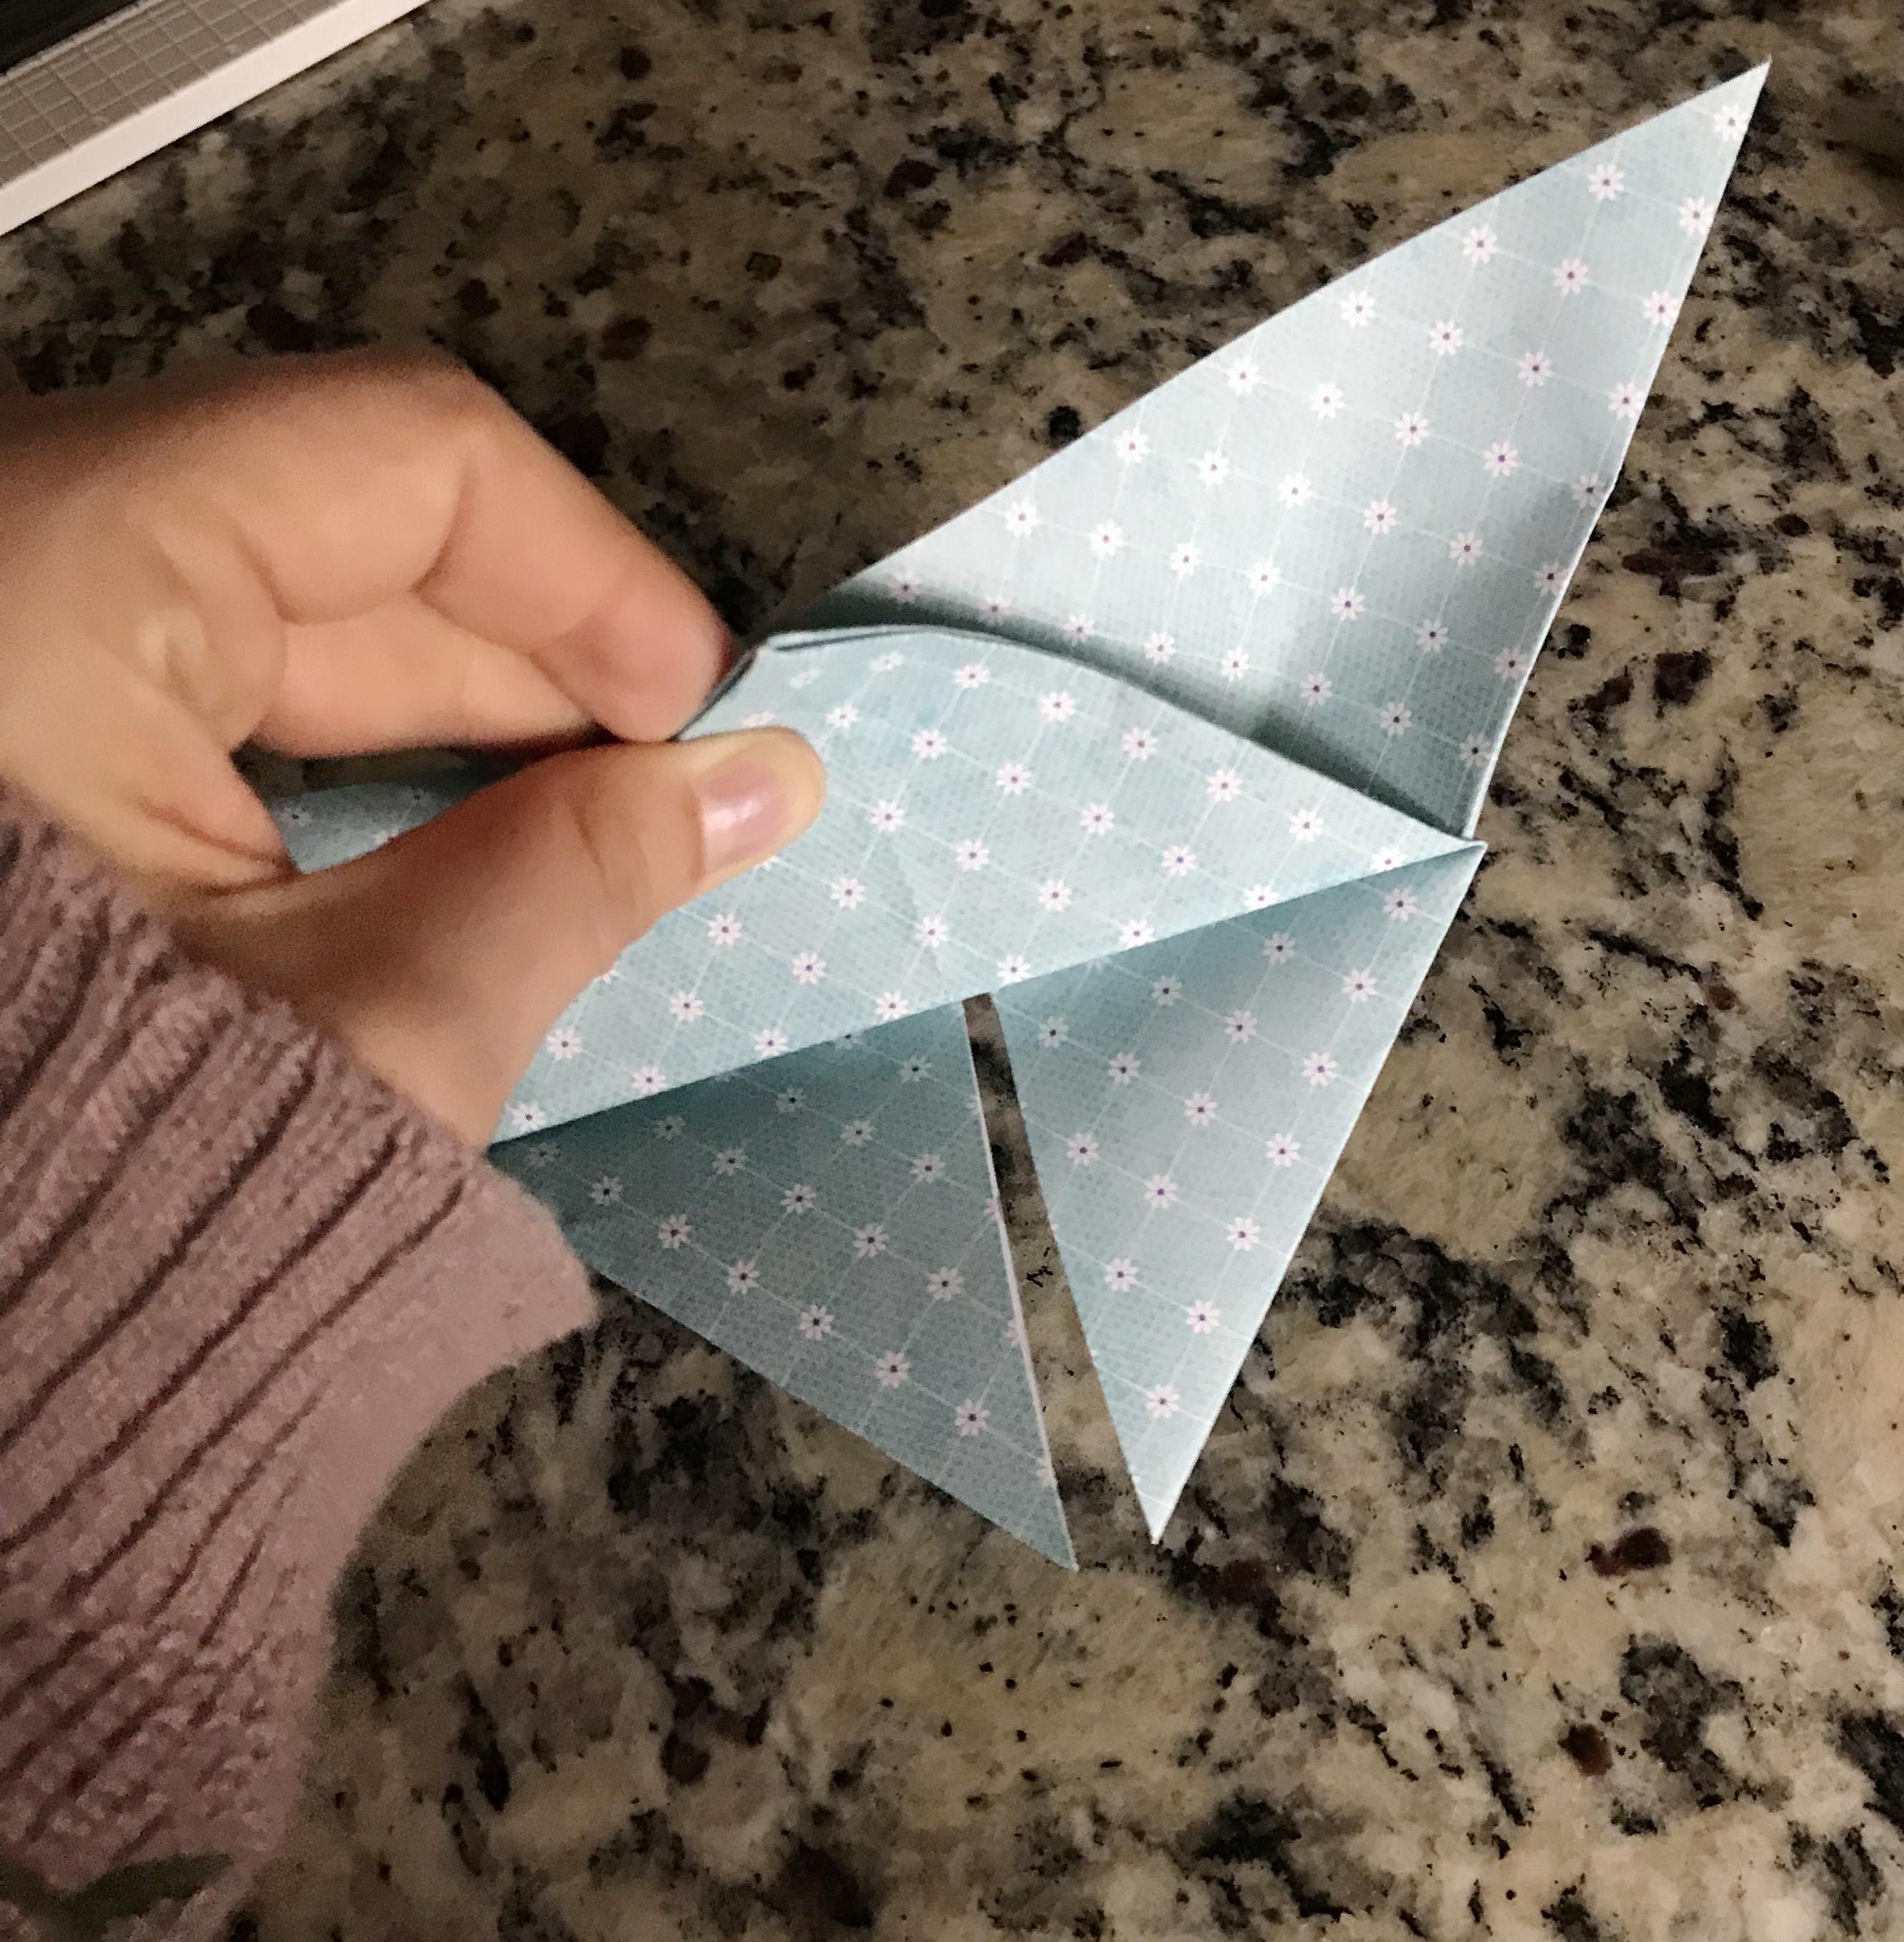 Secret-Garden-DIY-Paper-Craft-Butterfly-Creative-Memories19